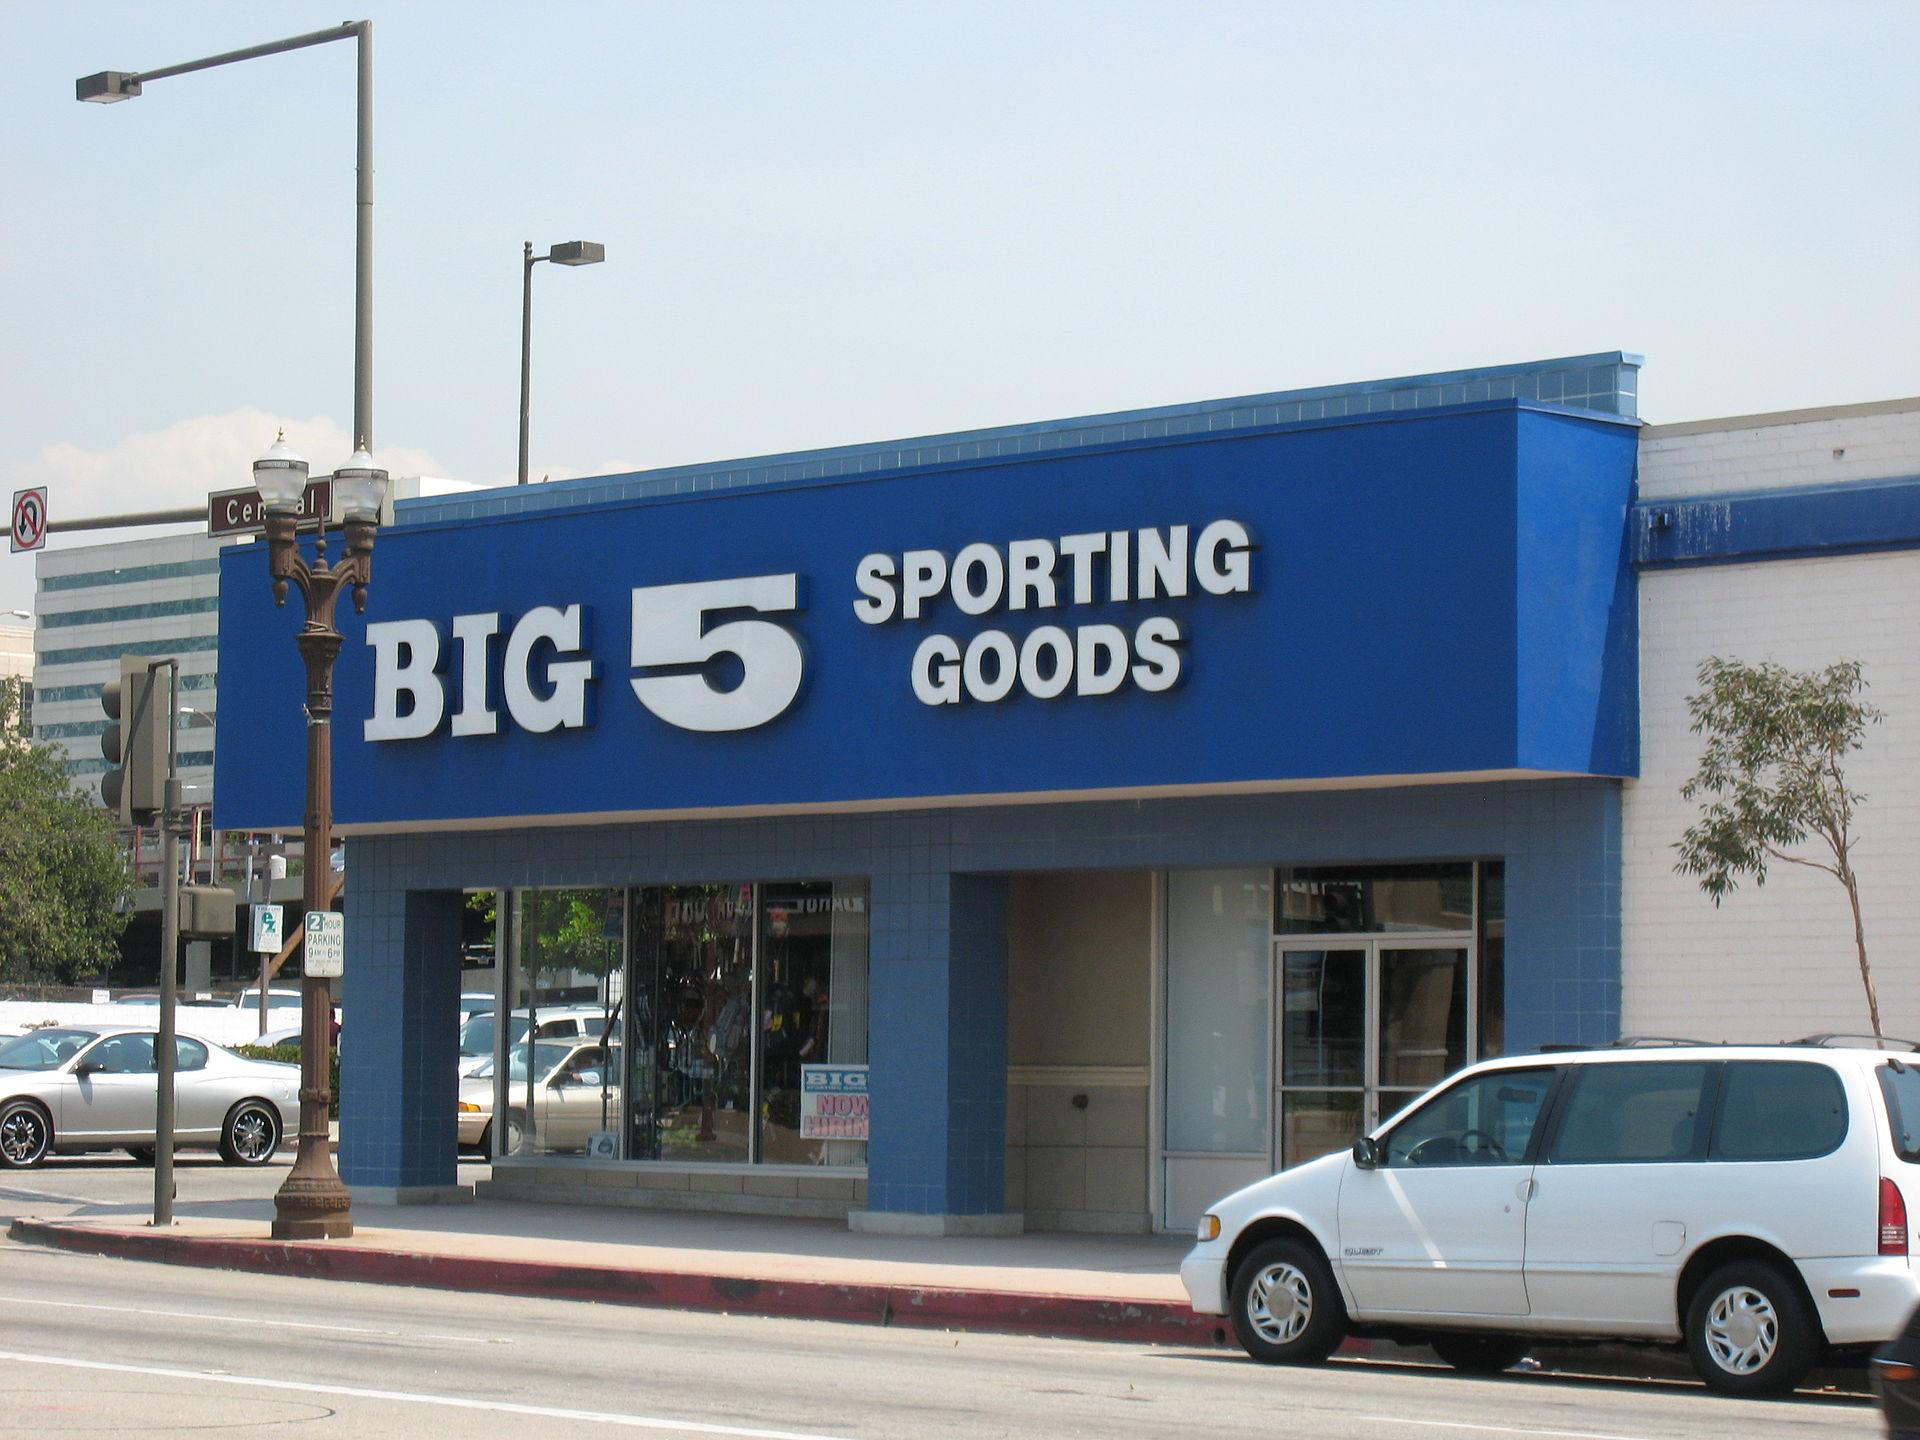 Big 5 Sporting Goods - Wikipedia